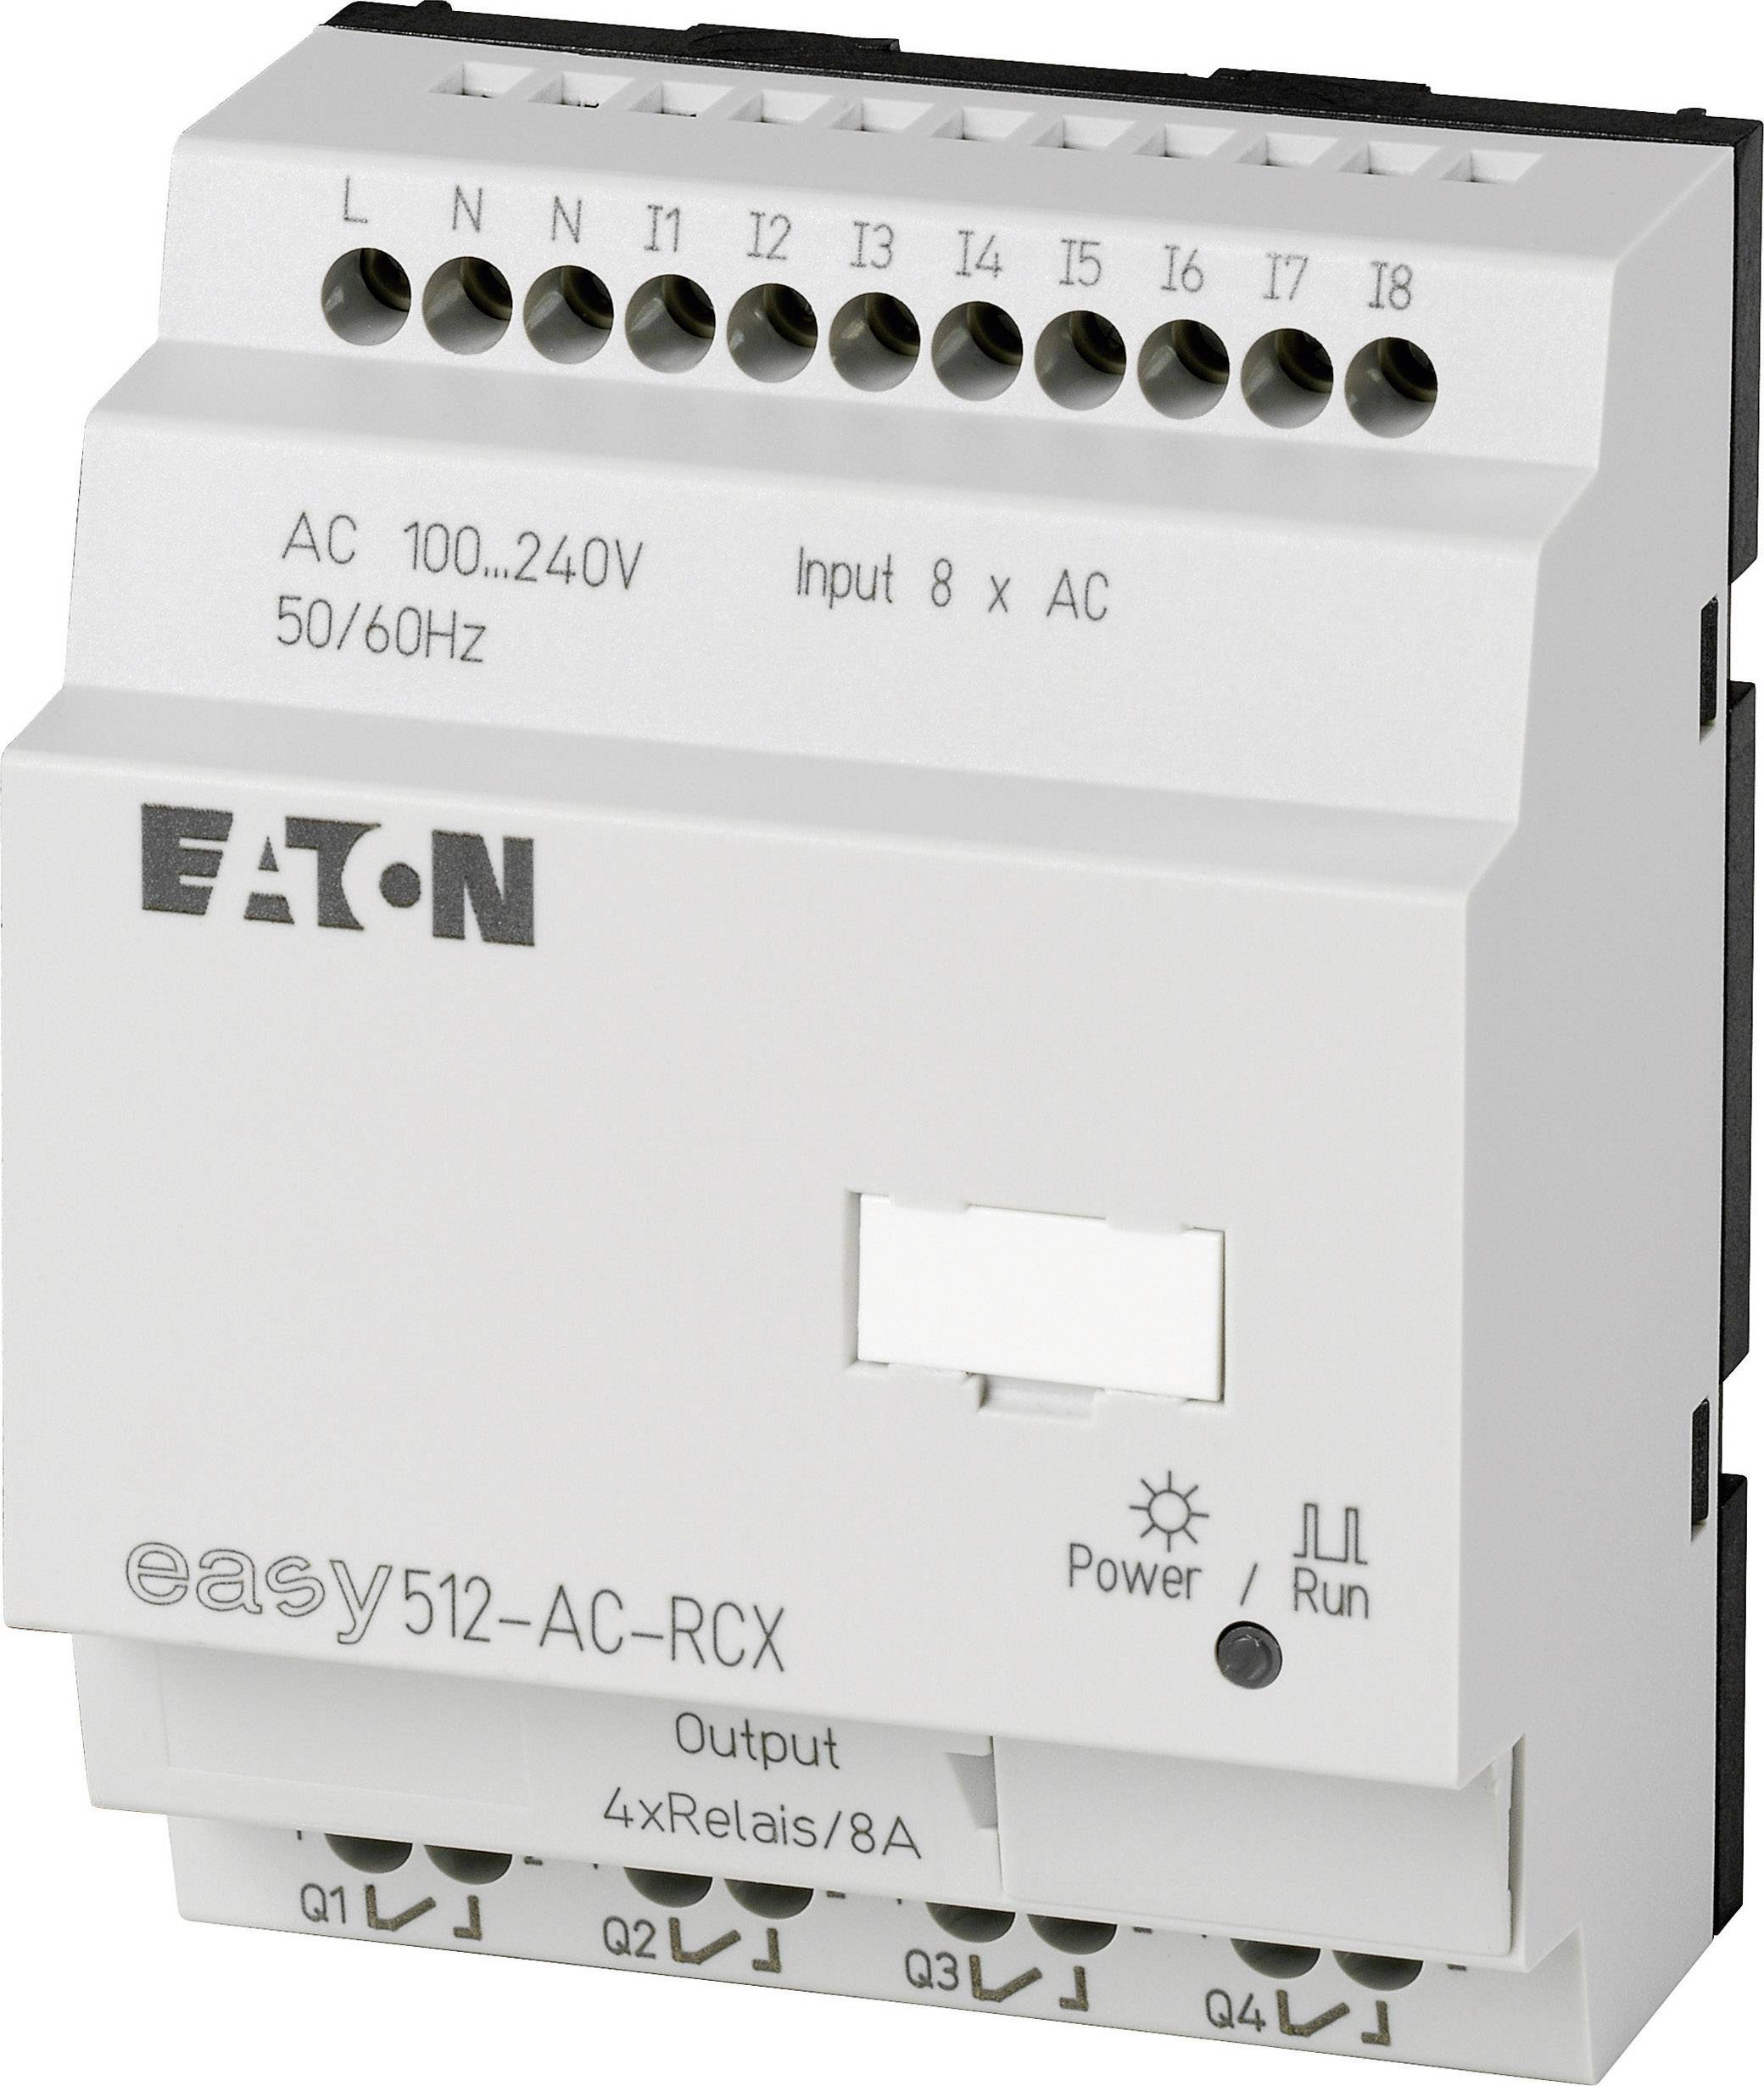 Řídicí reléový PLC modul Eaton easy 512-AC-RCX (274105), IP20, 4x relé, 115 - 230 V/AC